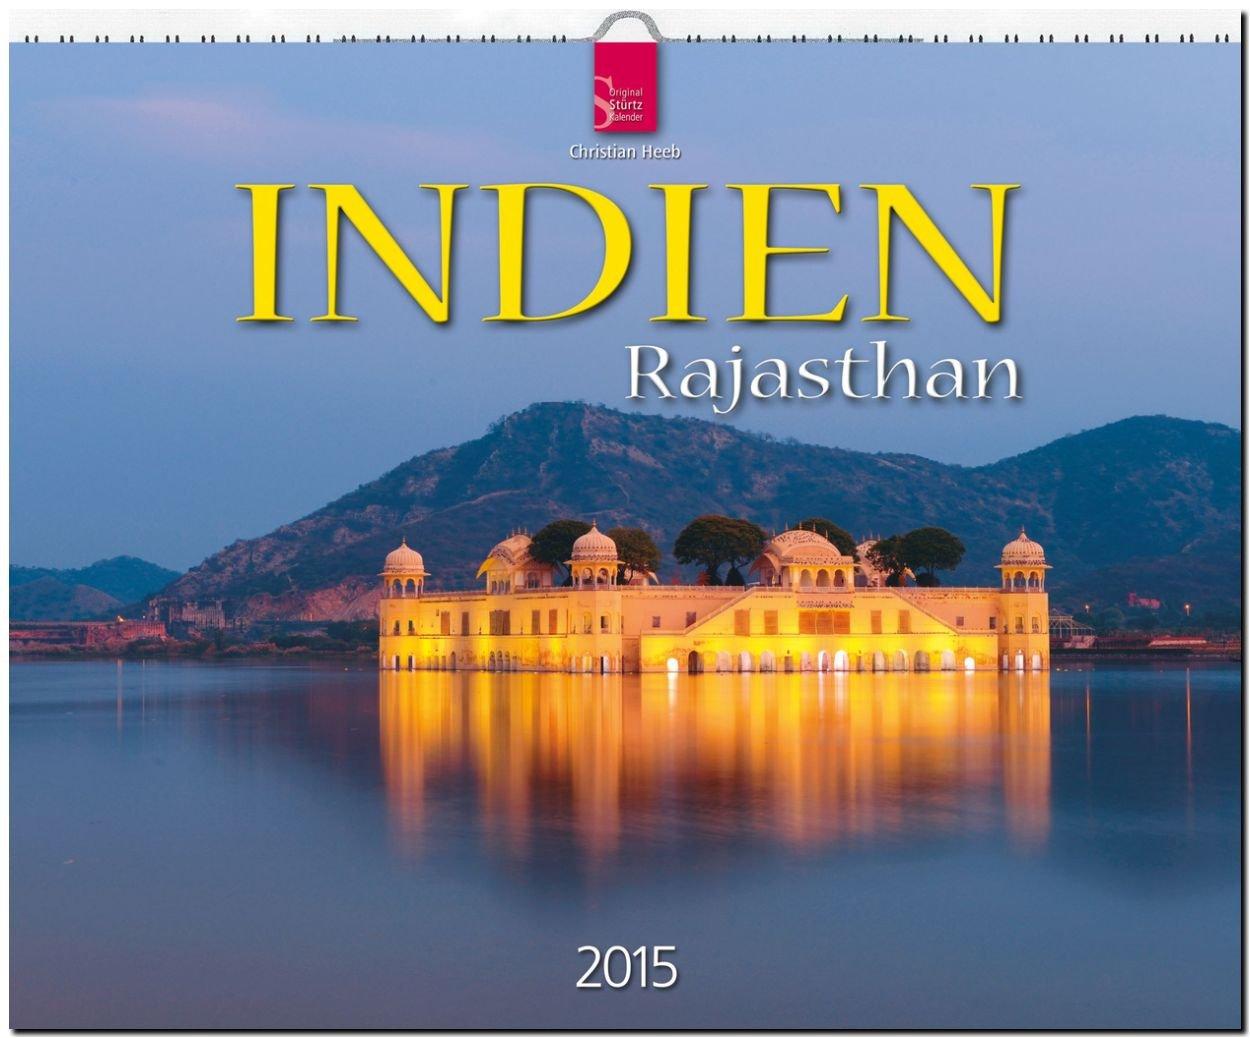 Indien / Rajasthan 2015 - Großformat-Kalender 60 x 48 cm